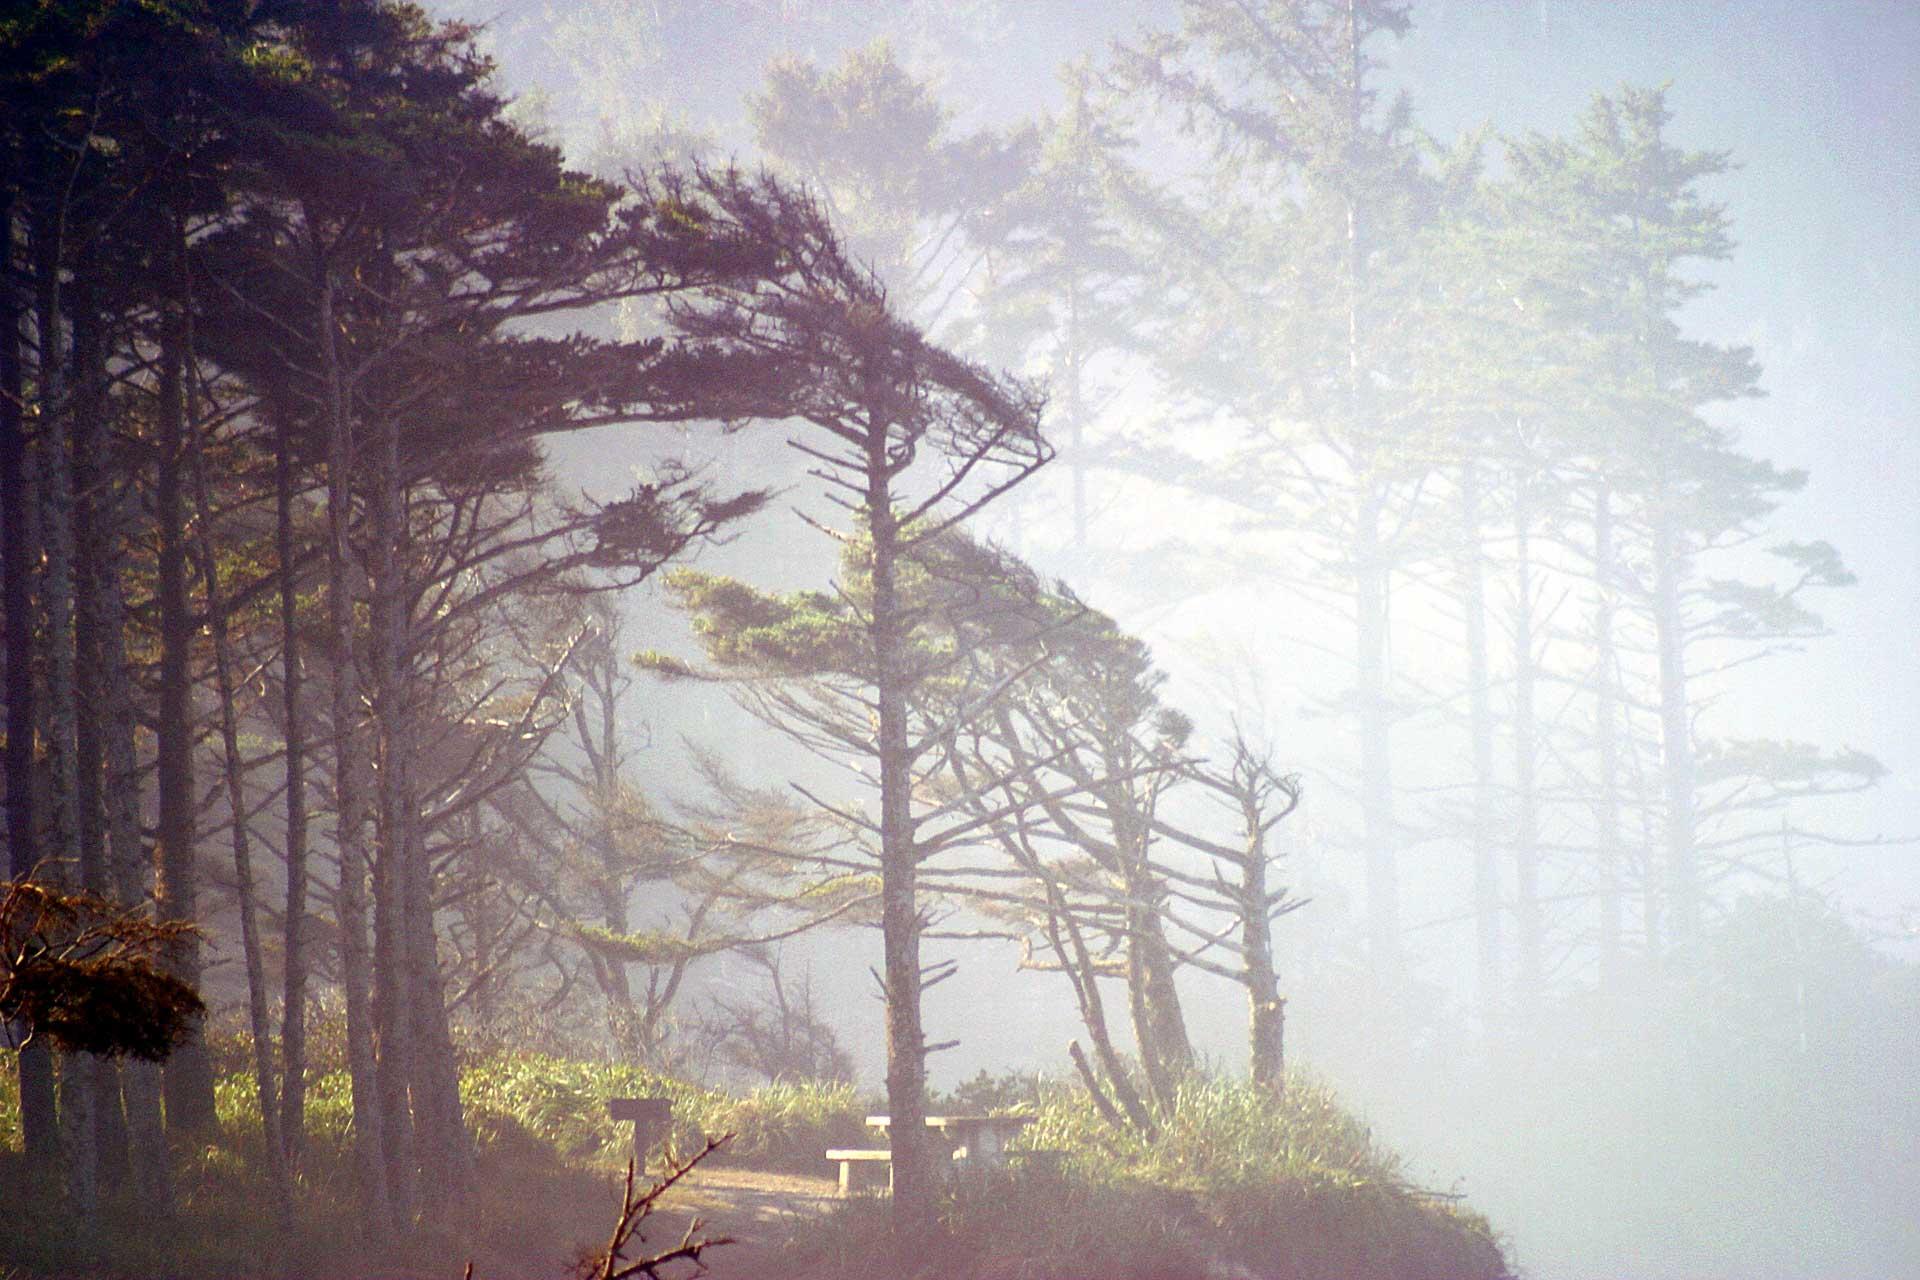 bruce berg fine art photography-3.jpg